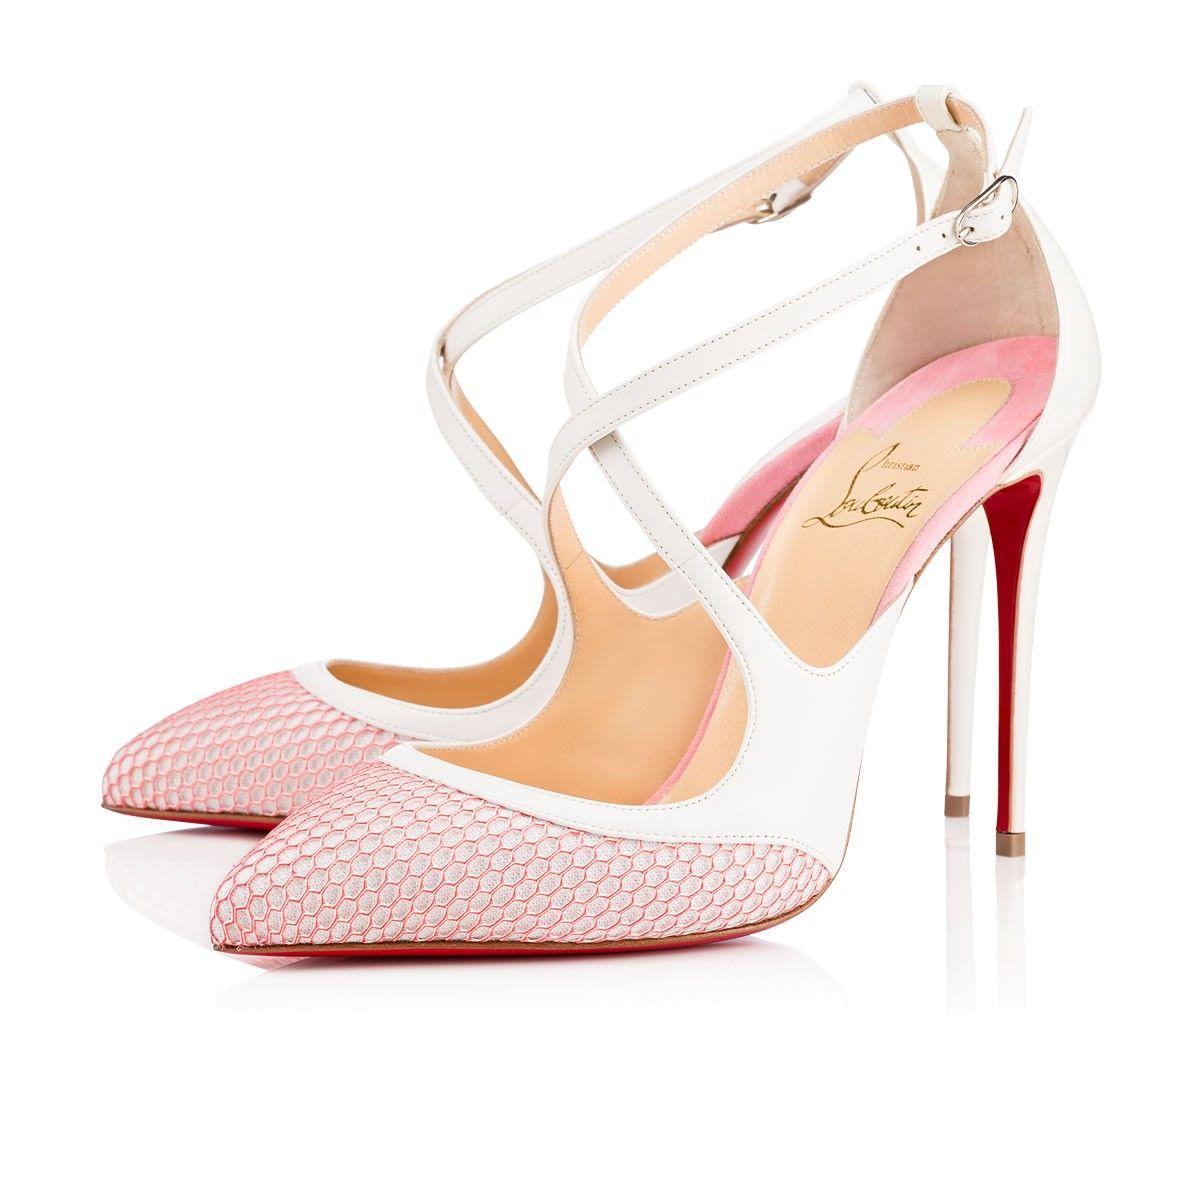 e6f0f82fb19 CHRISTIAN LOUBOUTIN Crissos 100 Version Dolly Leather - Women Shoes ...